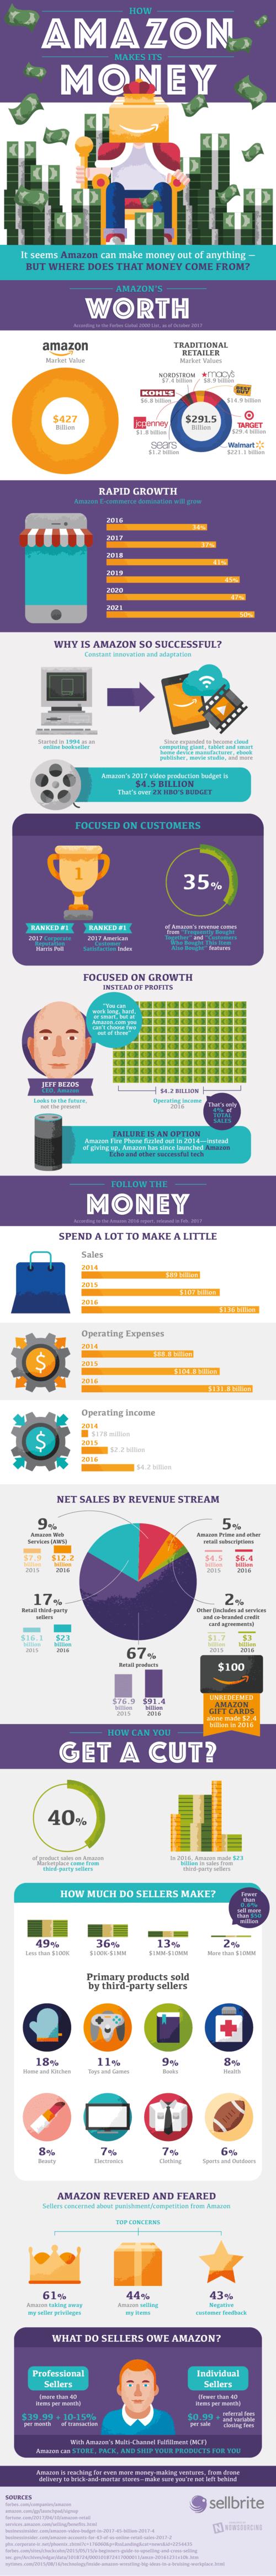 Infographic Post